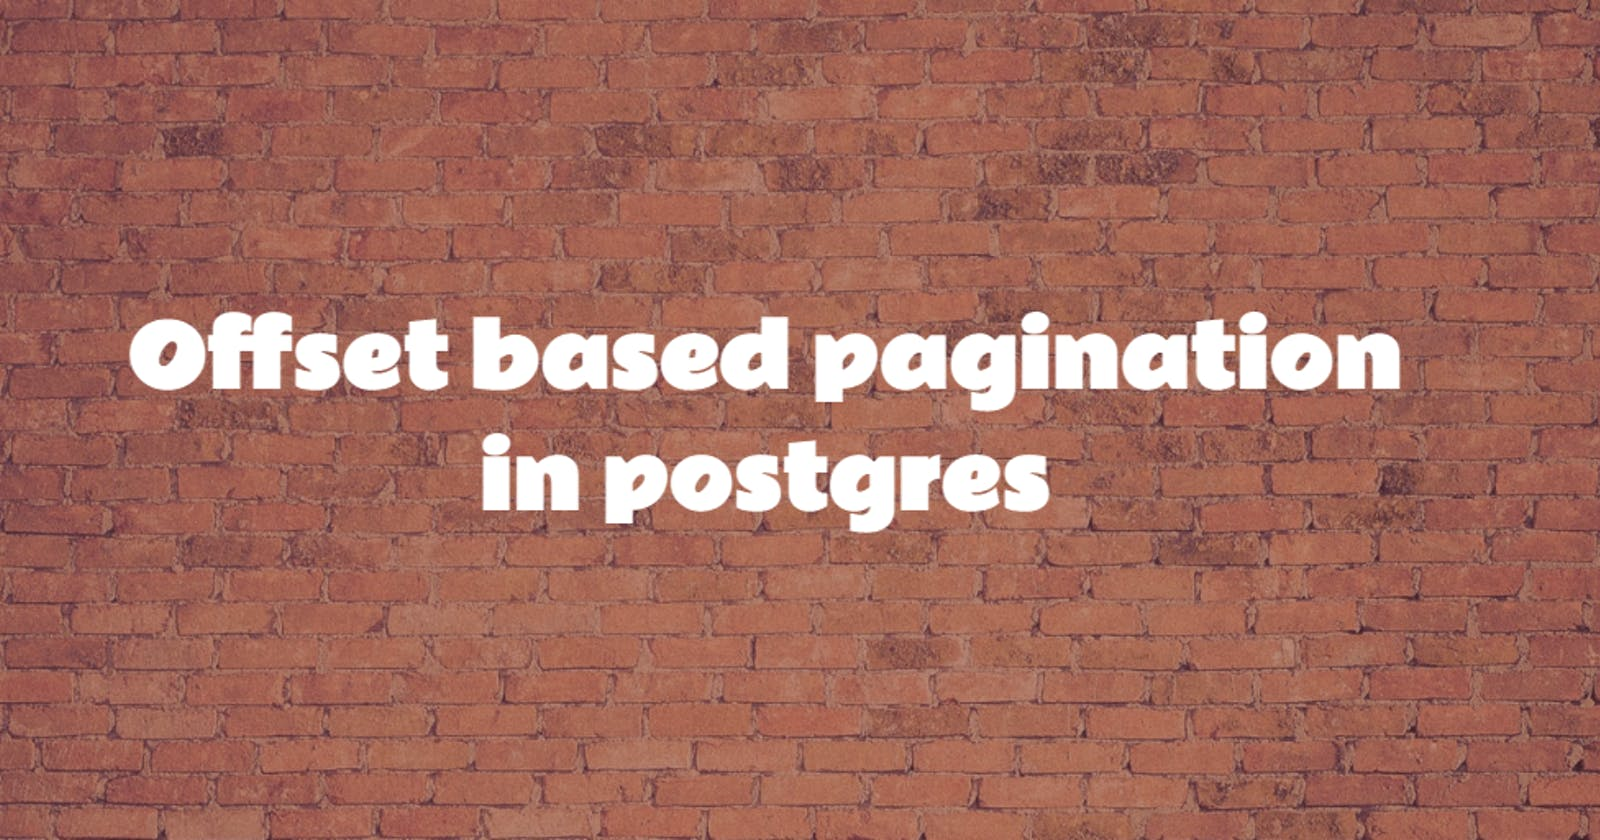 Offset based pagination in postgres